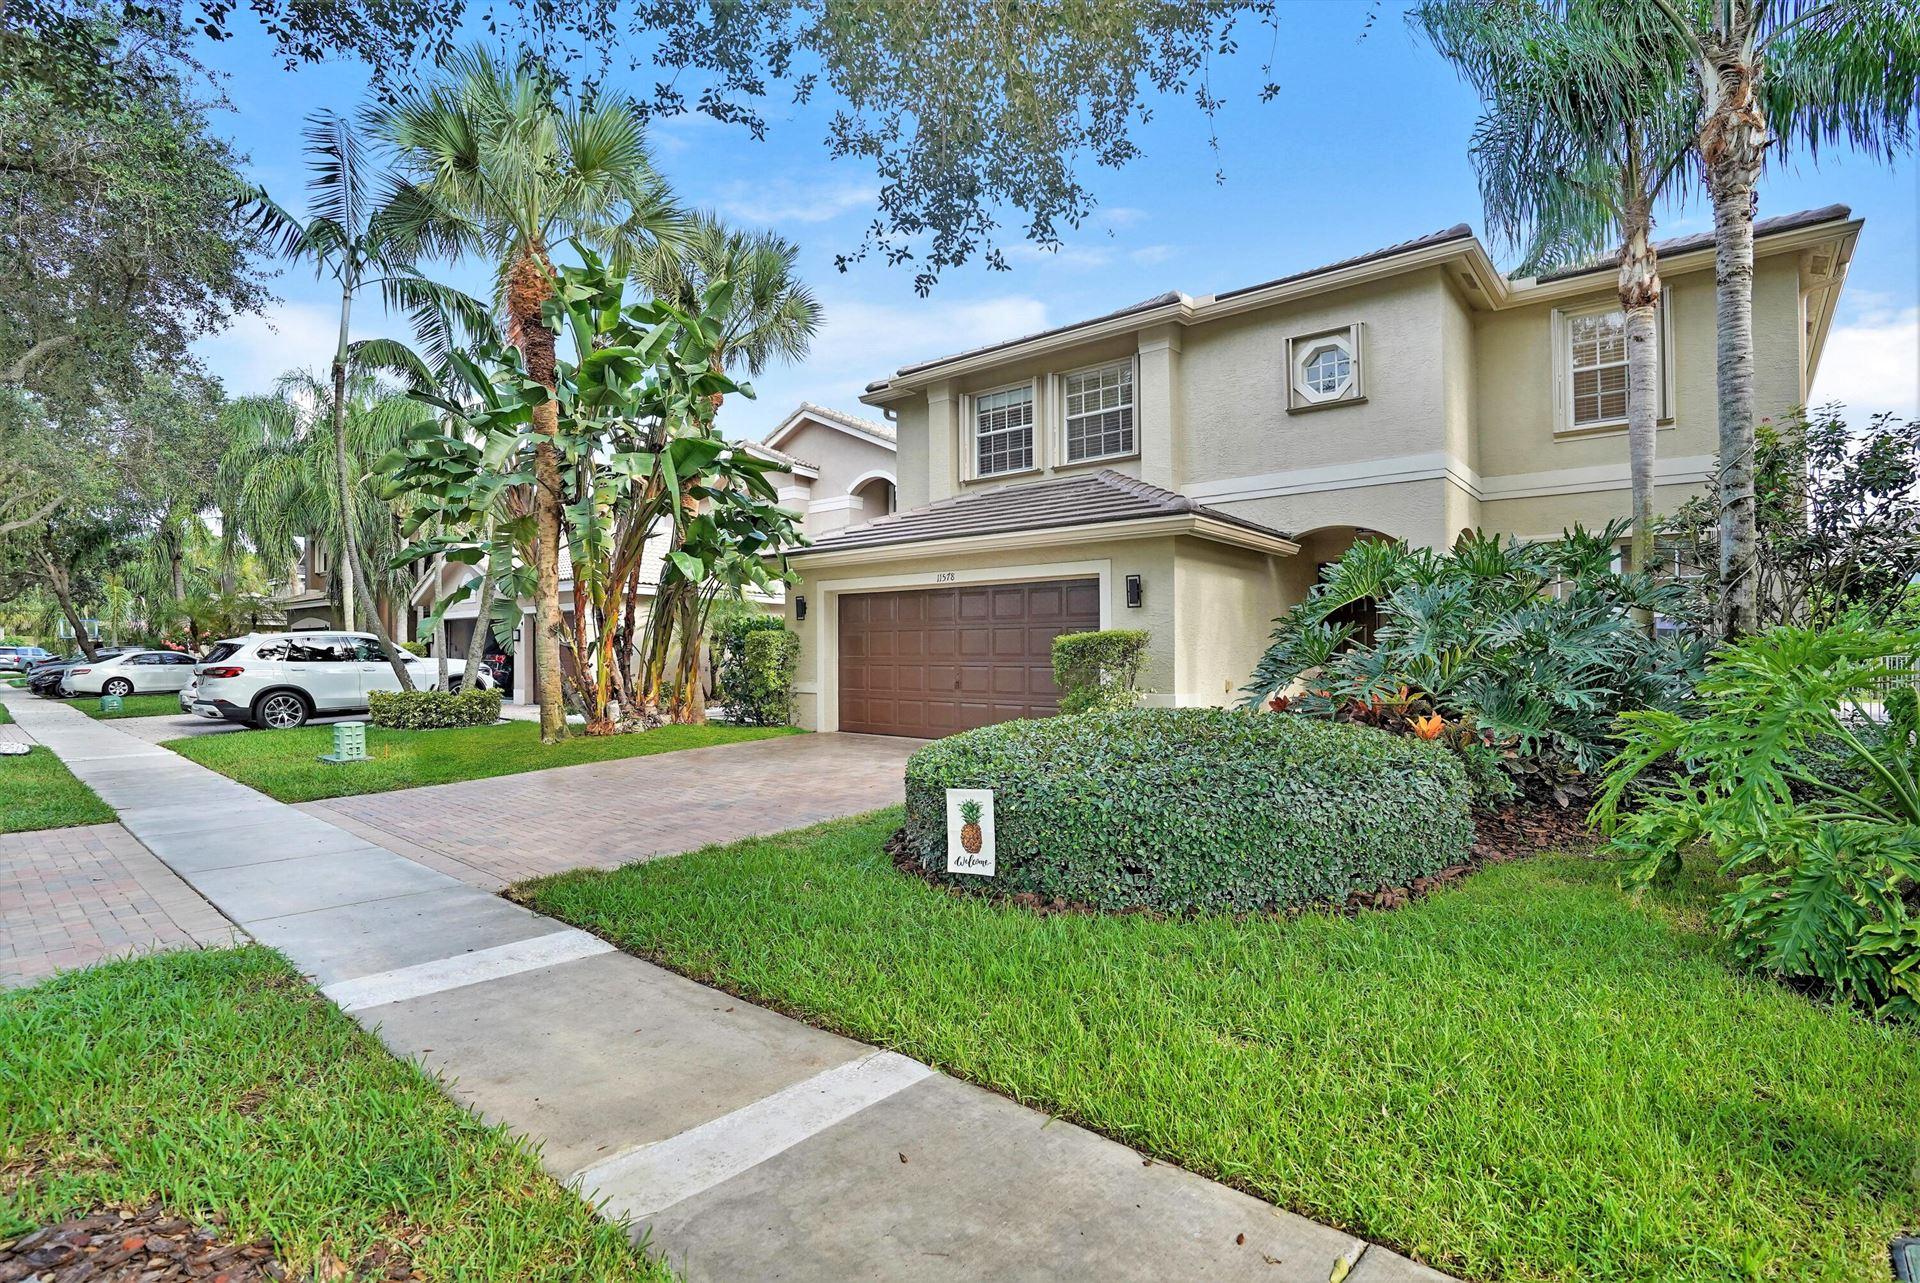 11578 Big Sky Court, Boca Raton, FL 33498 - #: RX-10739181